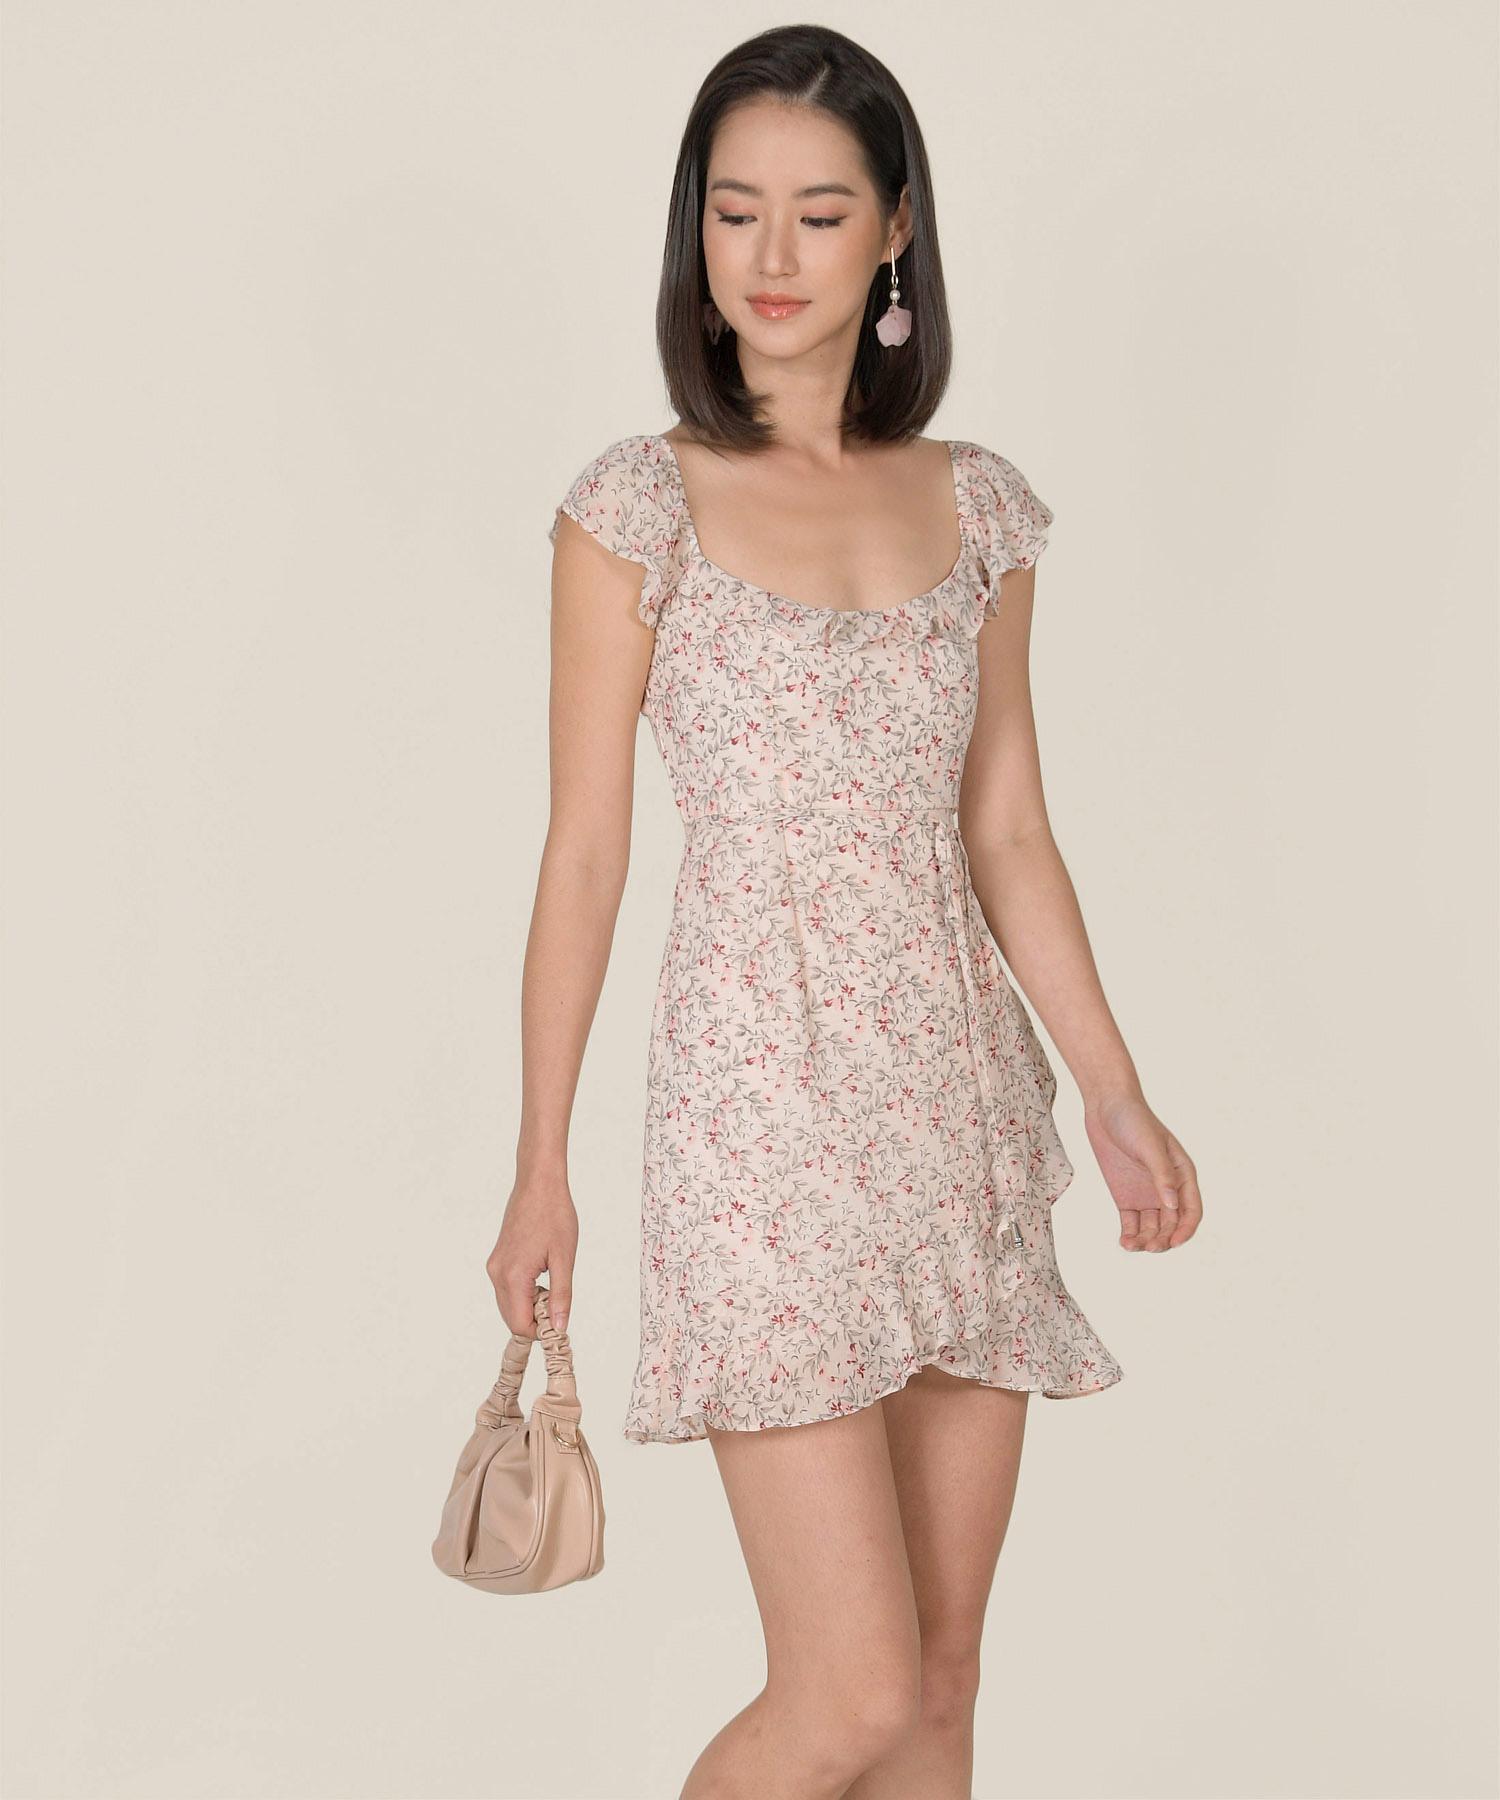 maxime-floral-ruffle-dress-blush-pink-2